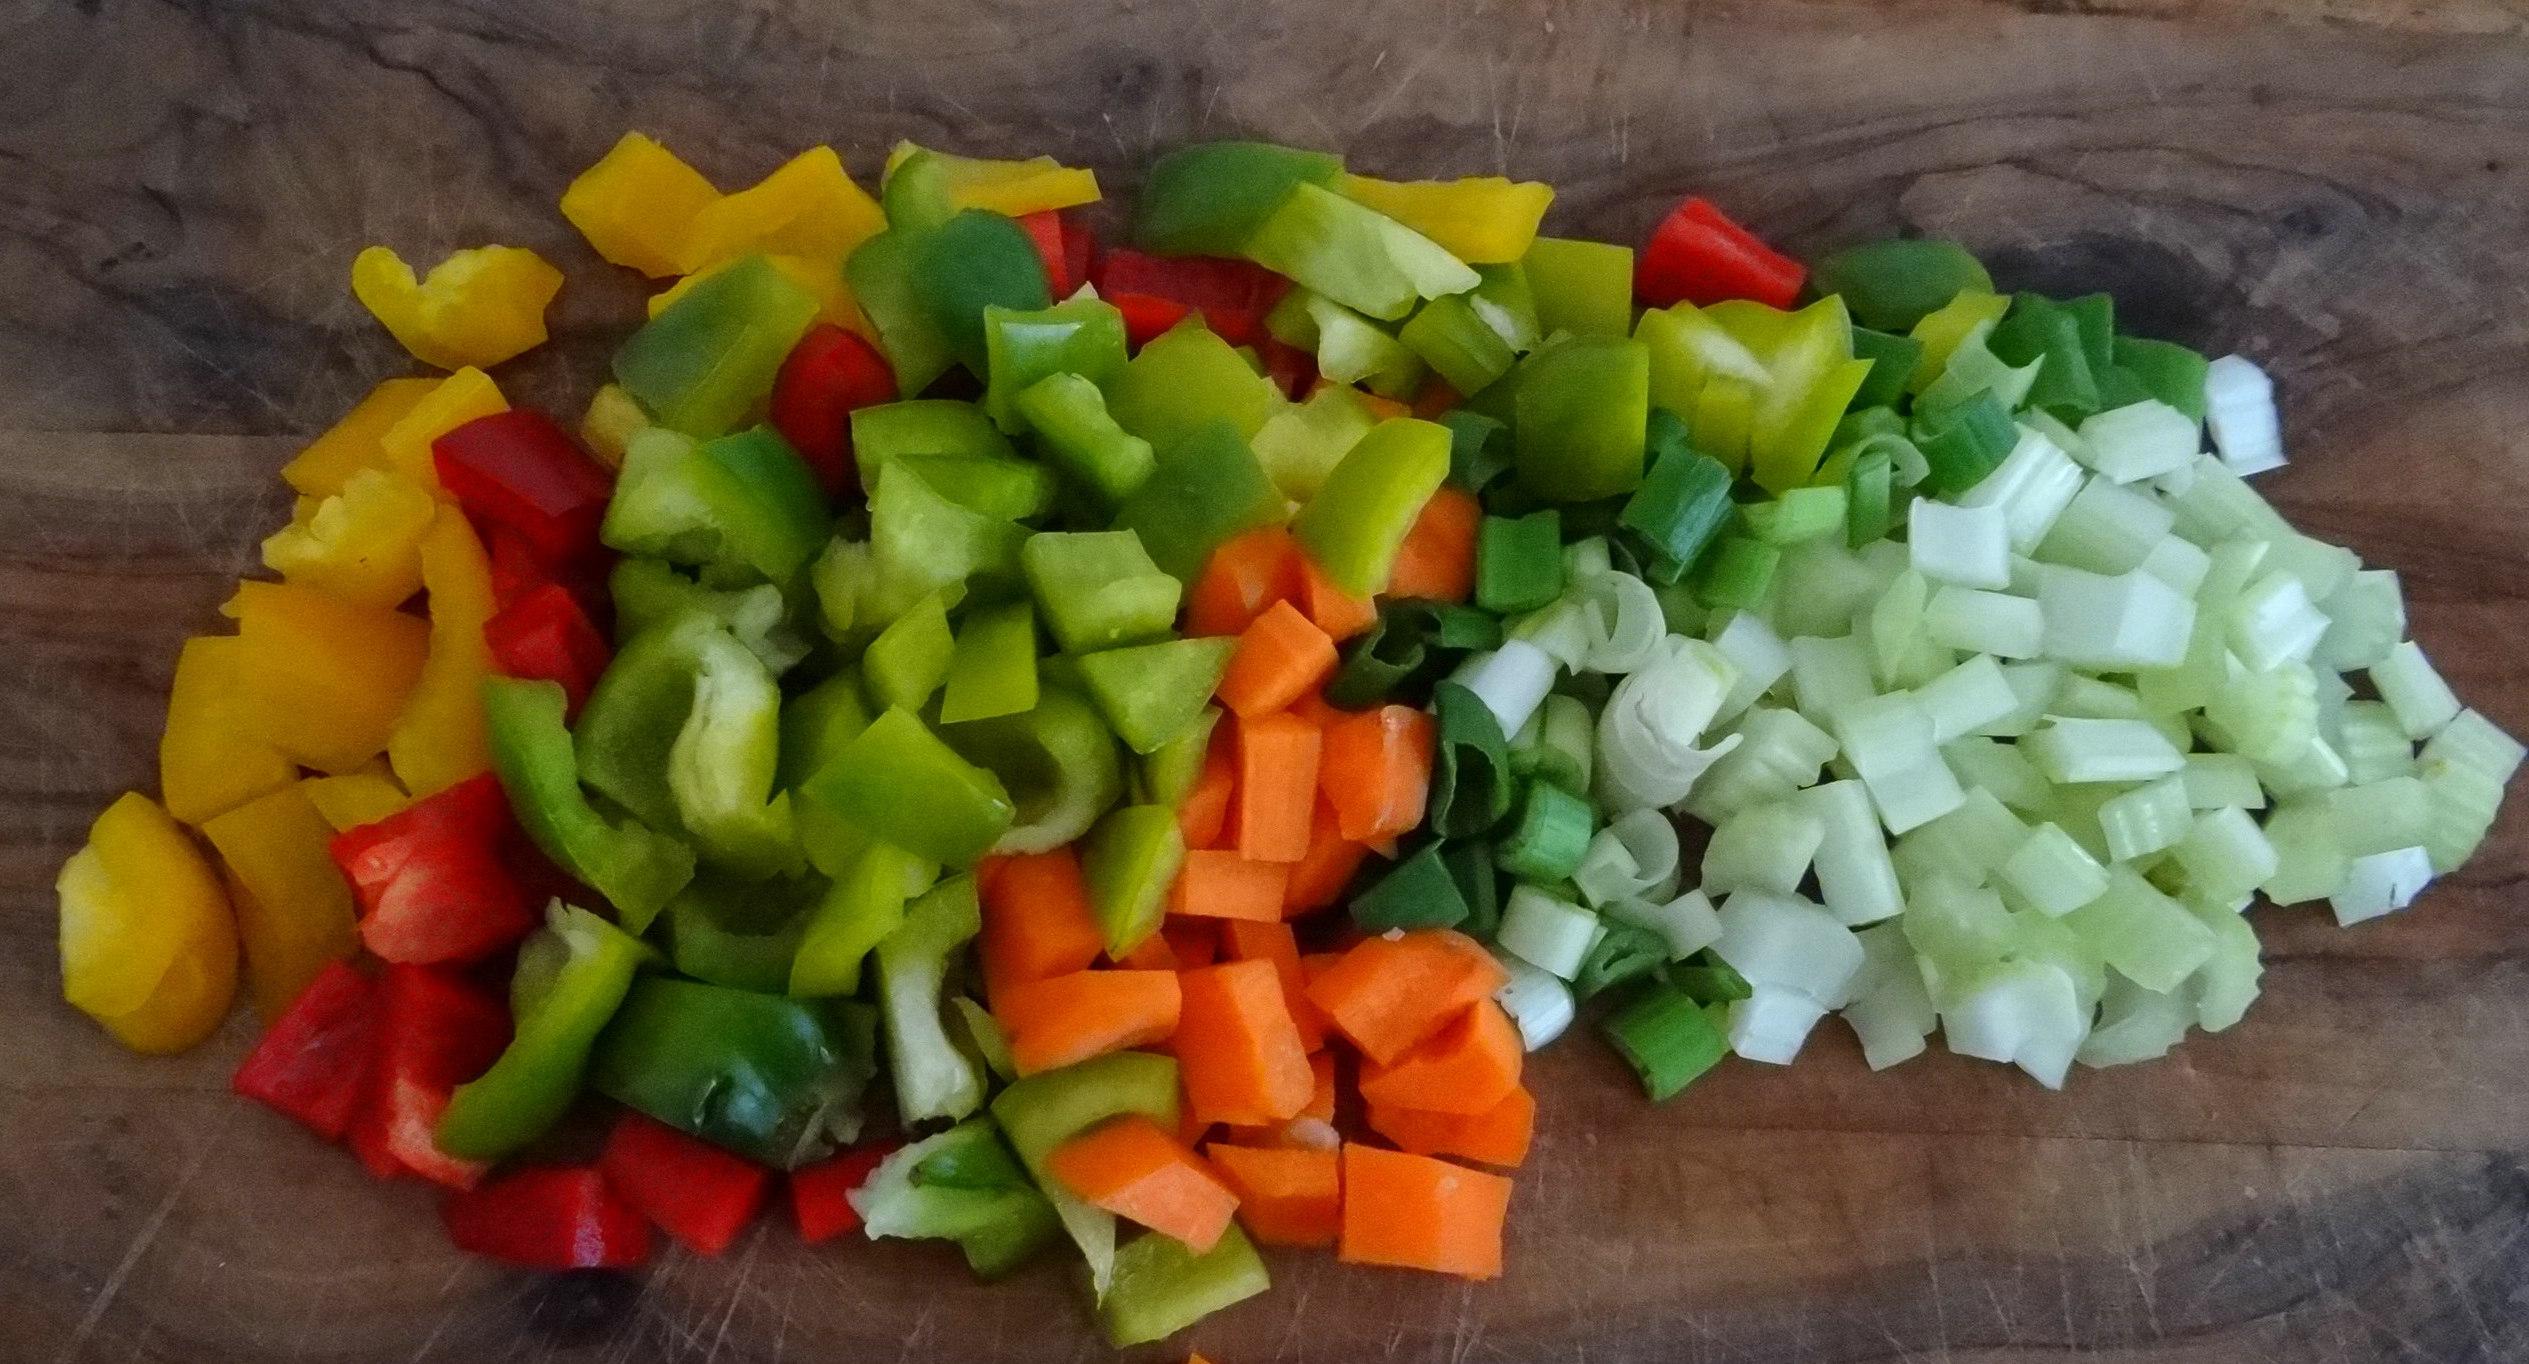 Forelle,Kartoffeln,Salat,Dips (5)